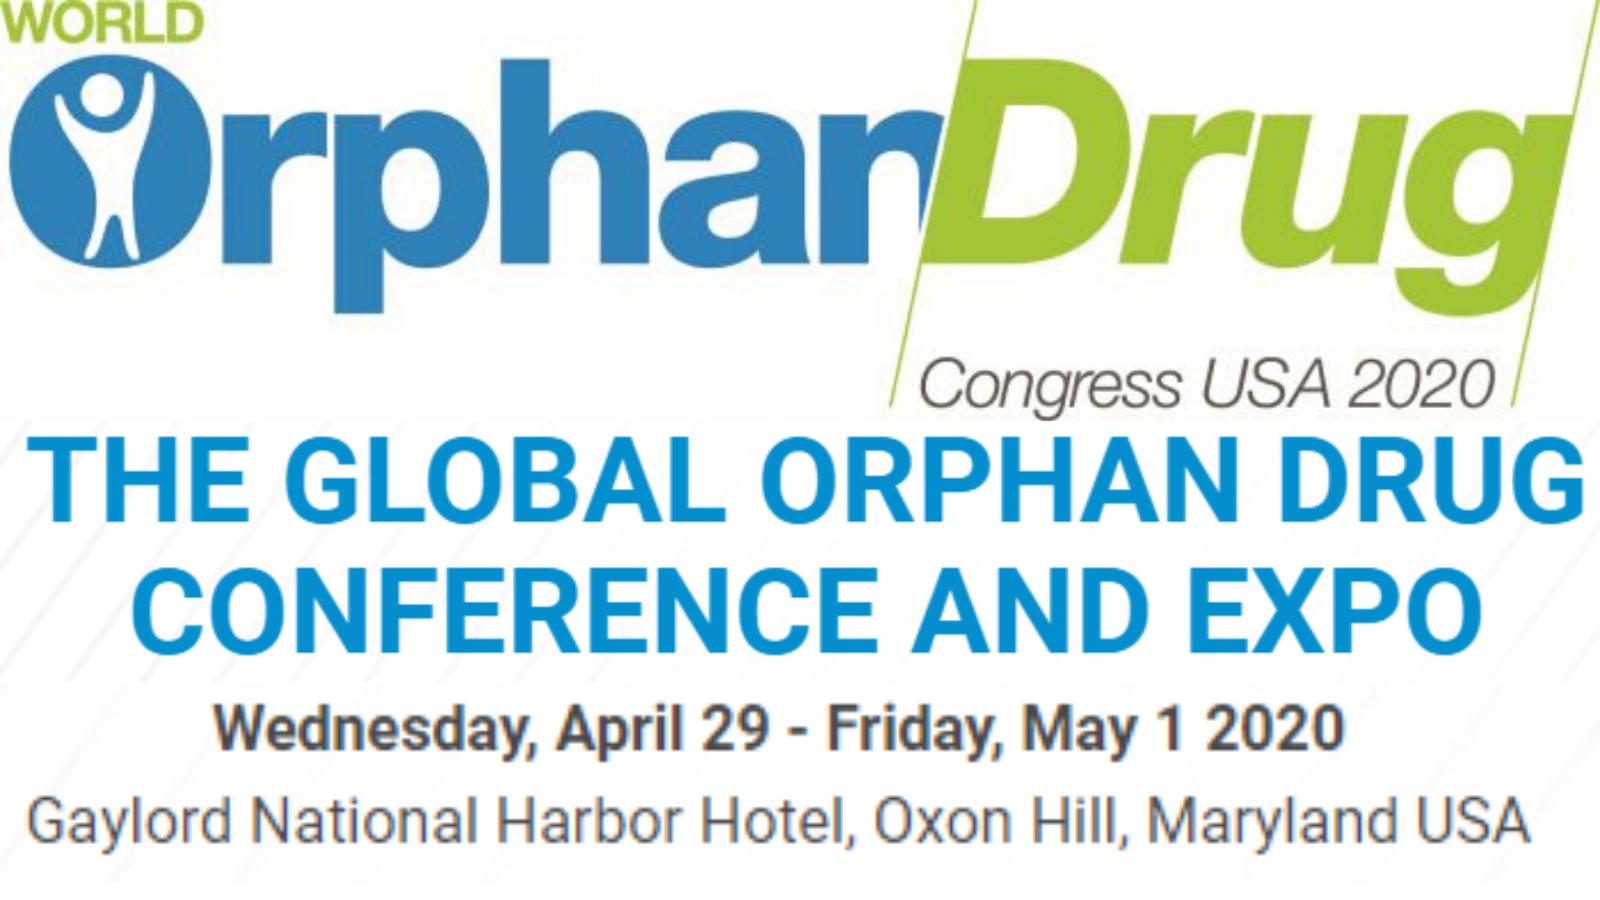 World Orphan Drug Congress USA 2020